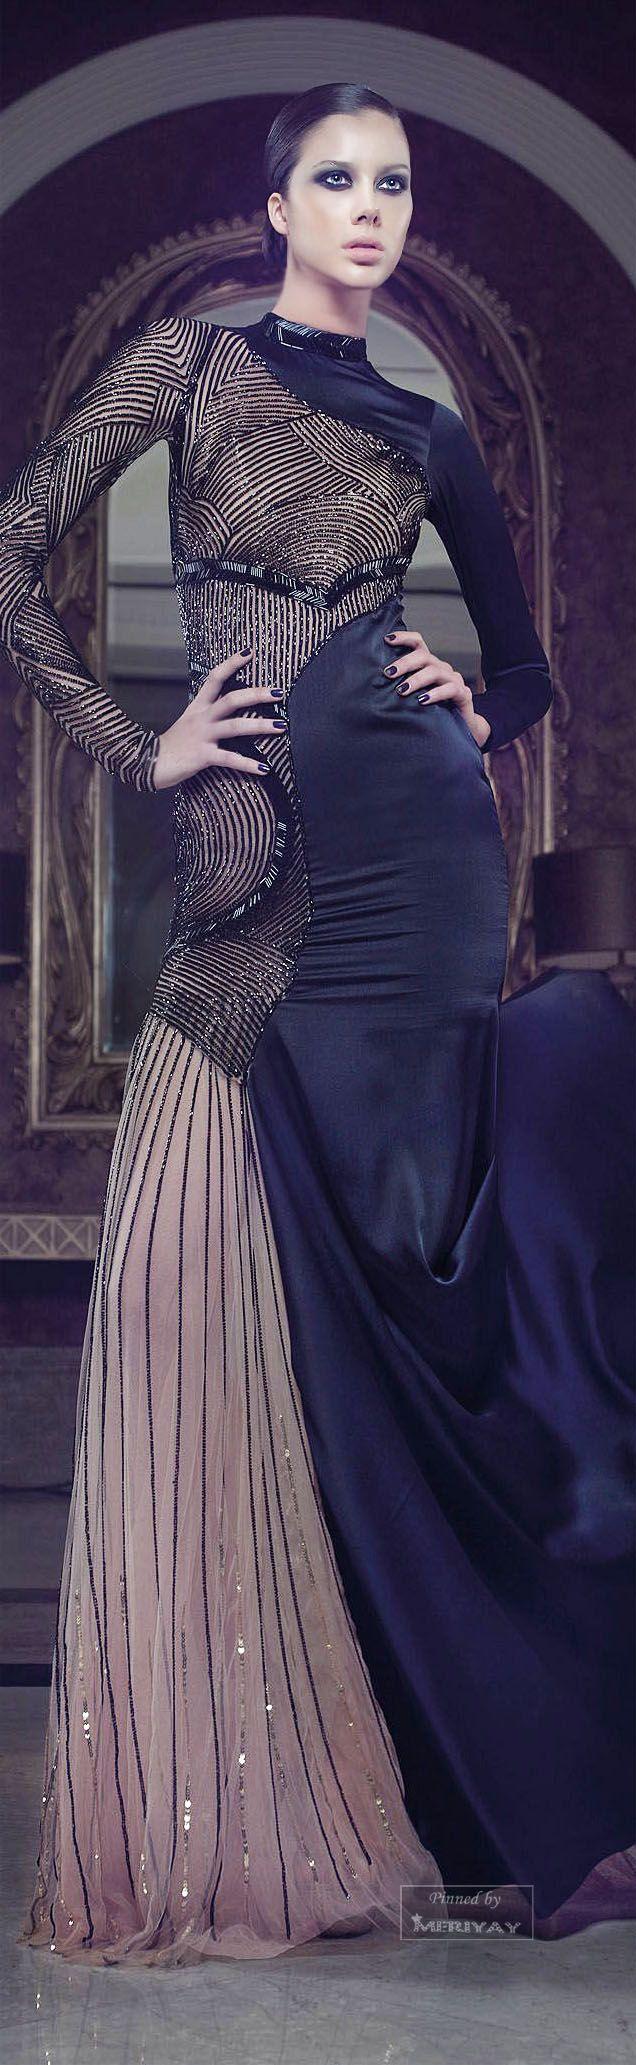 "Charbel Karam ""Midnight lust"", 2015 collection."